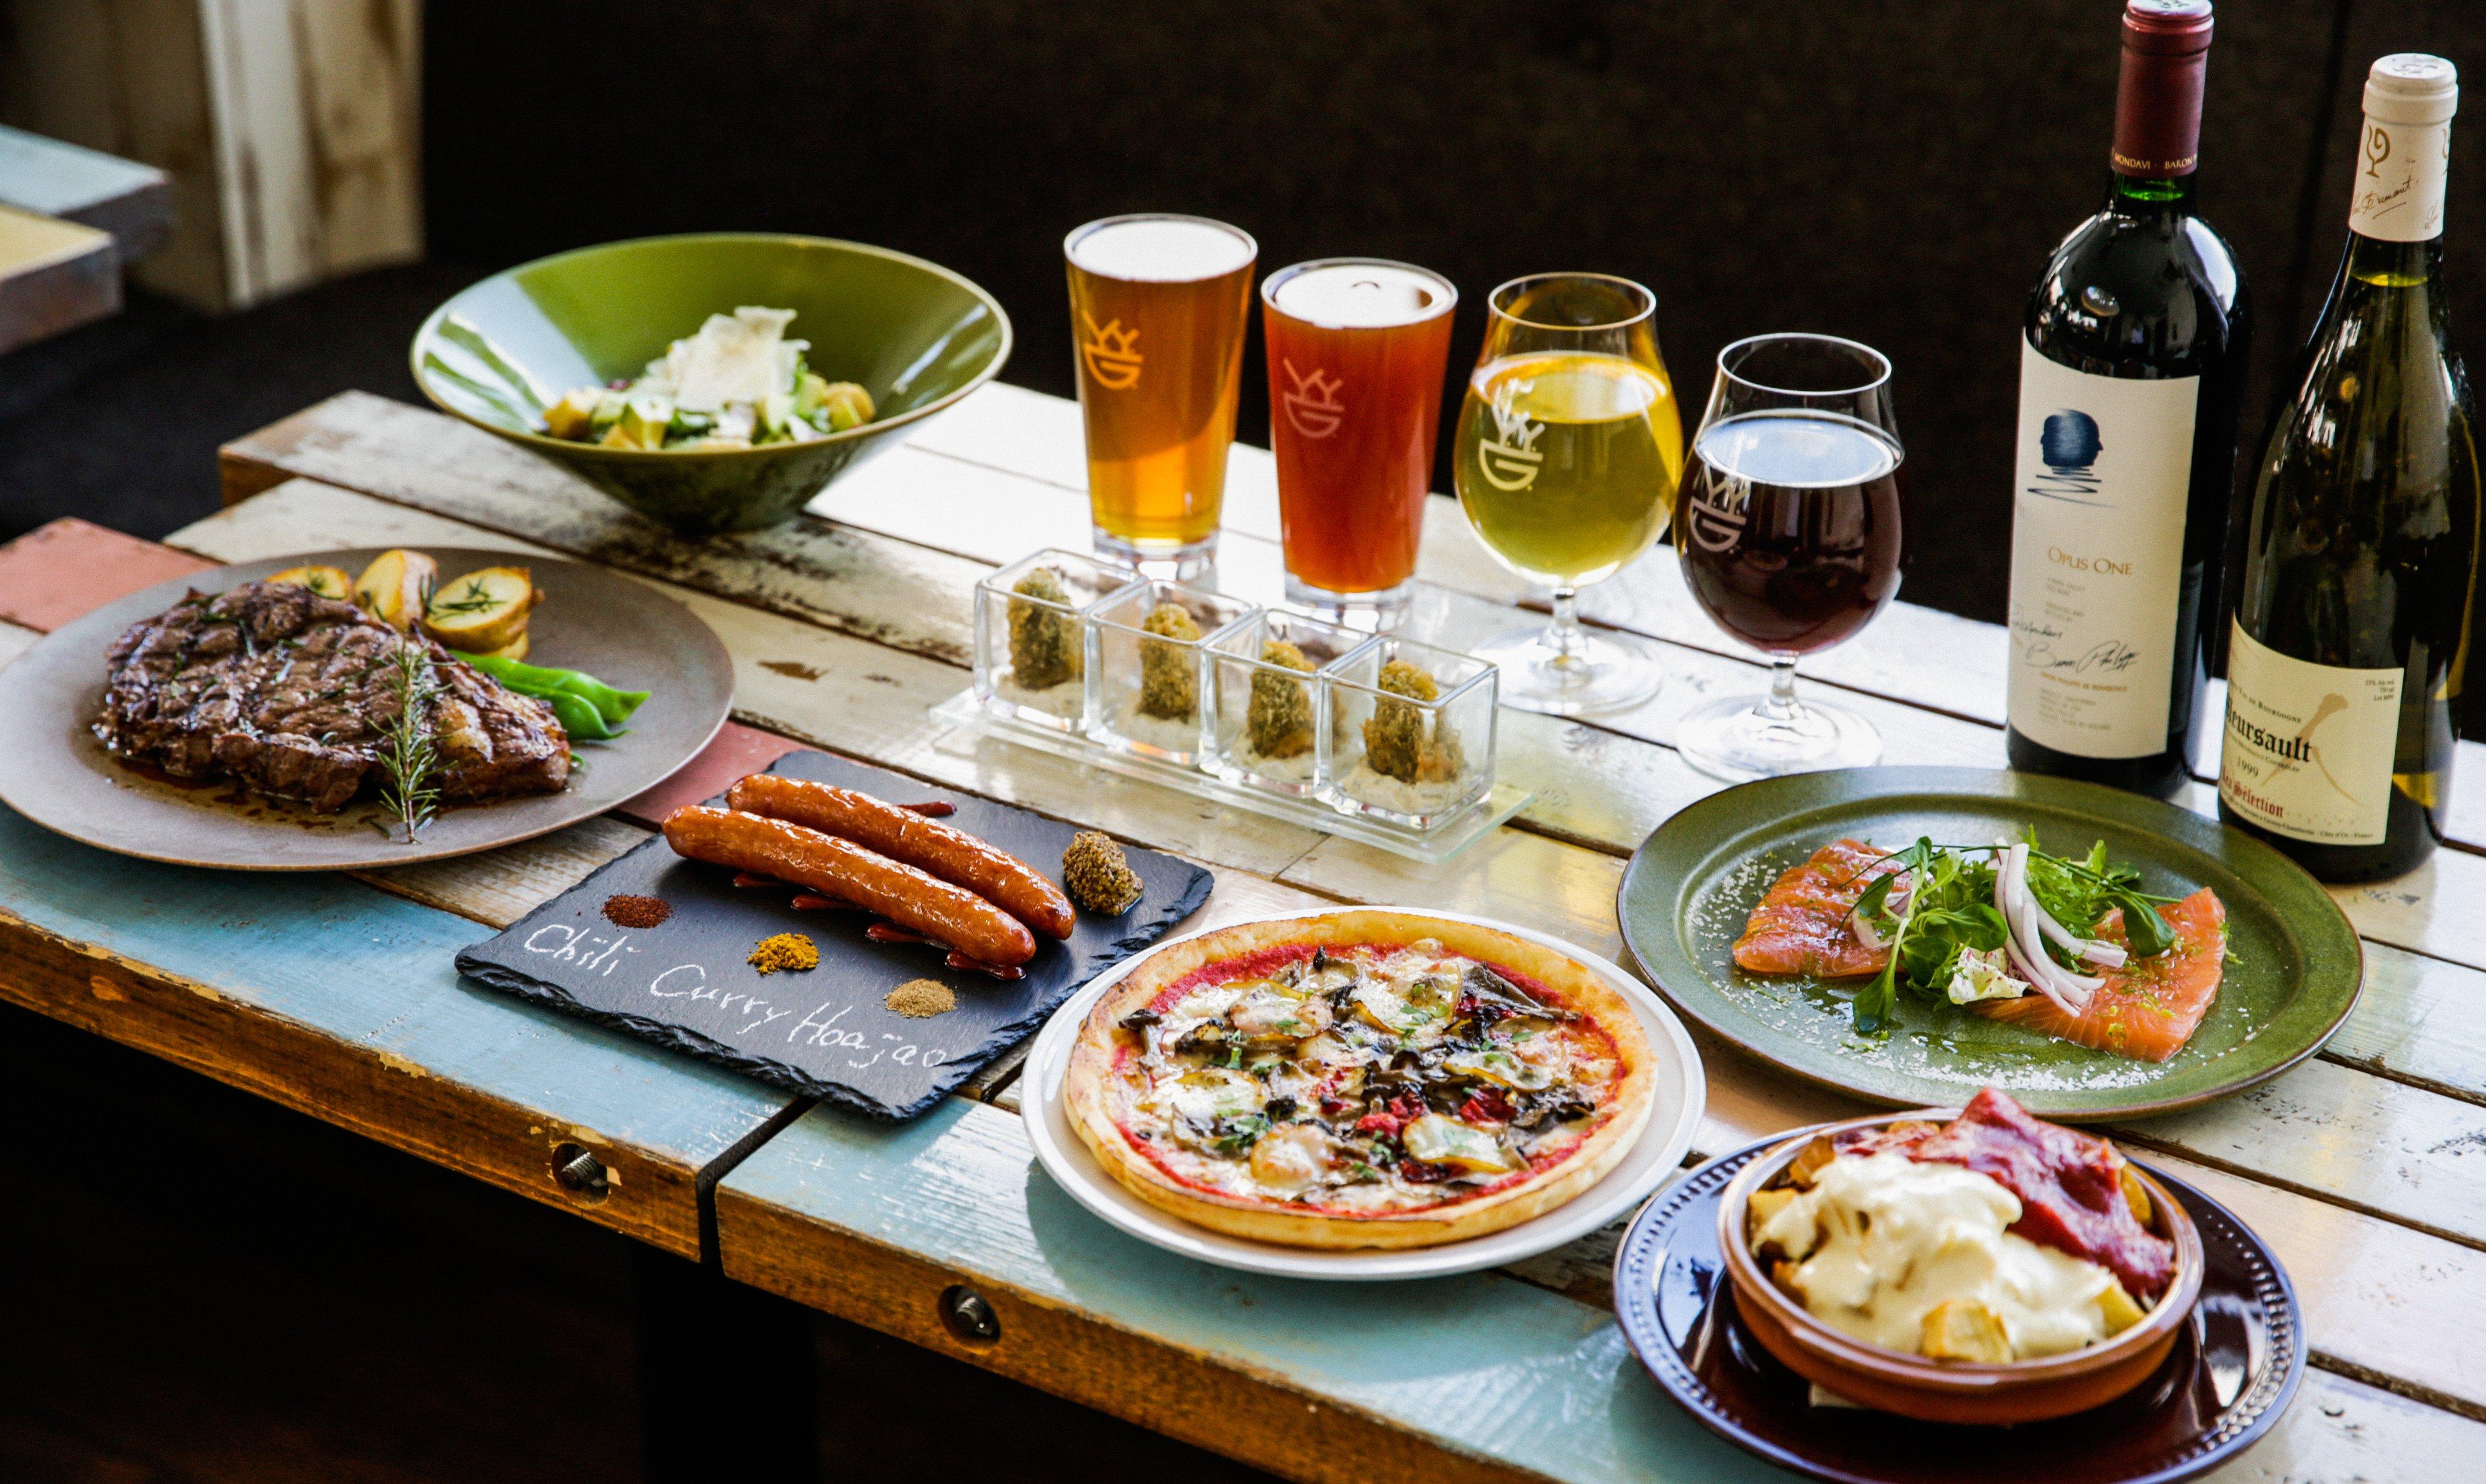 Y.Y.G. Brewery & Beer Kitchen-人氣套餐 全 7 品 附喝到飽